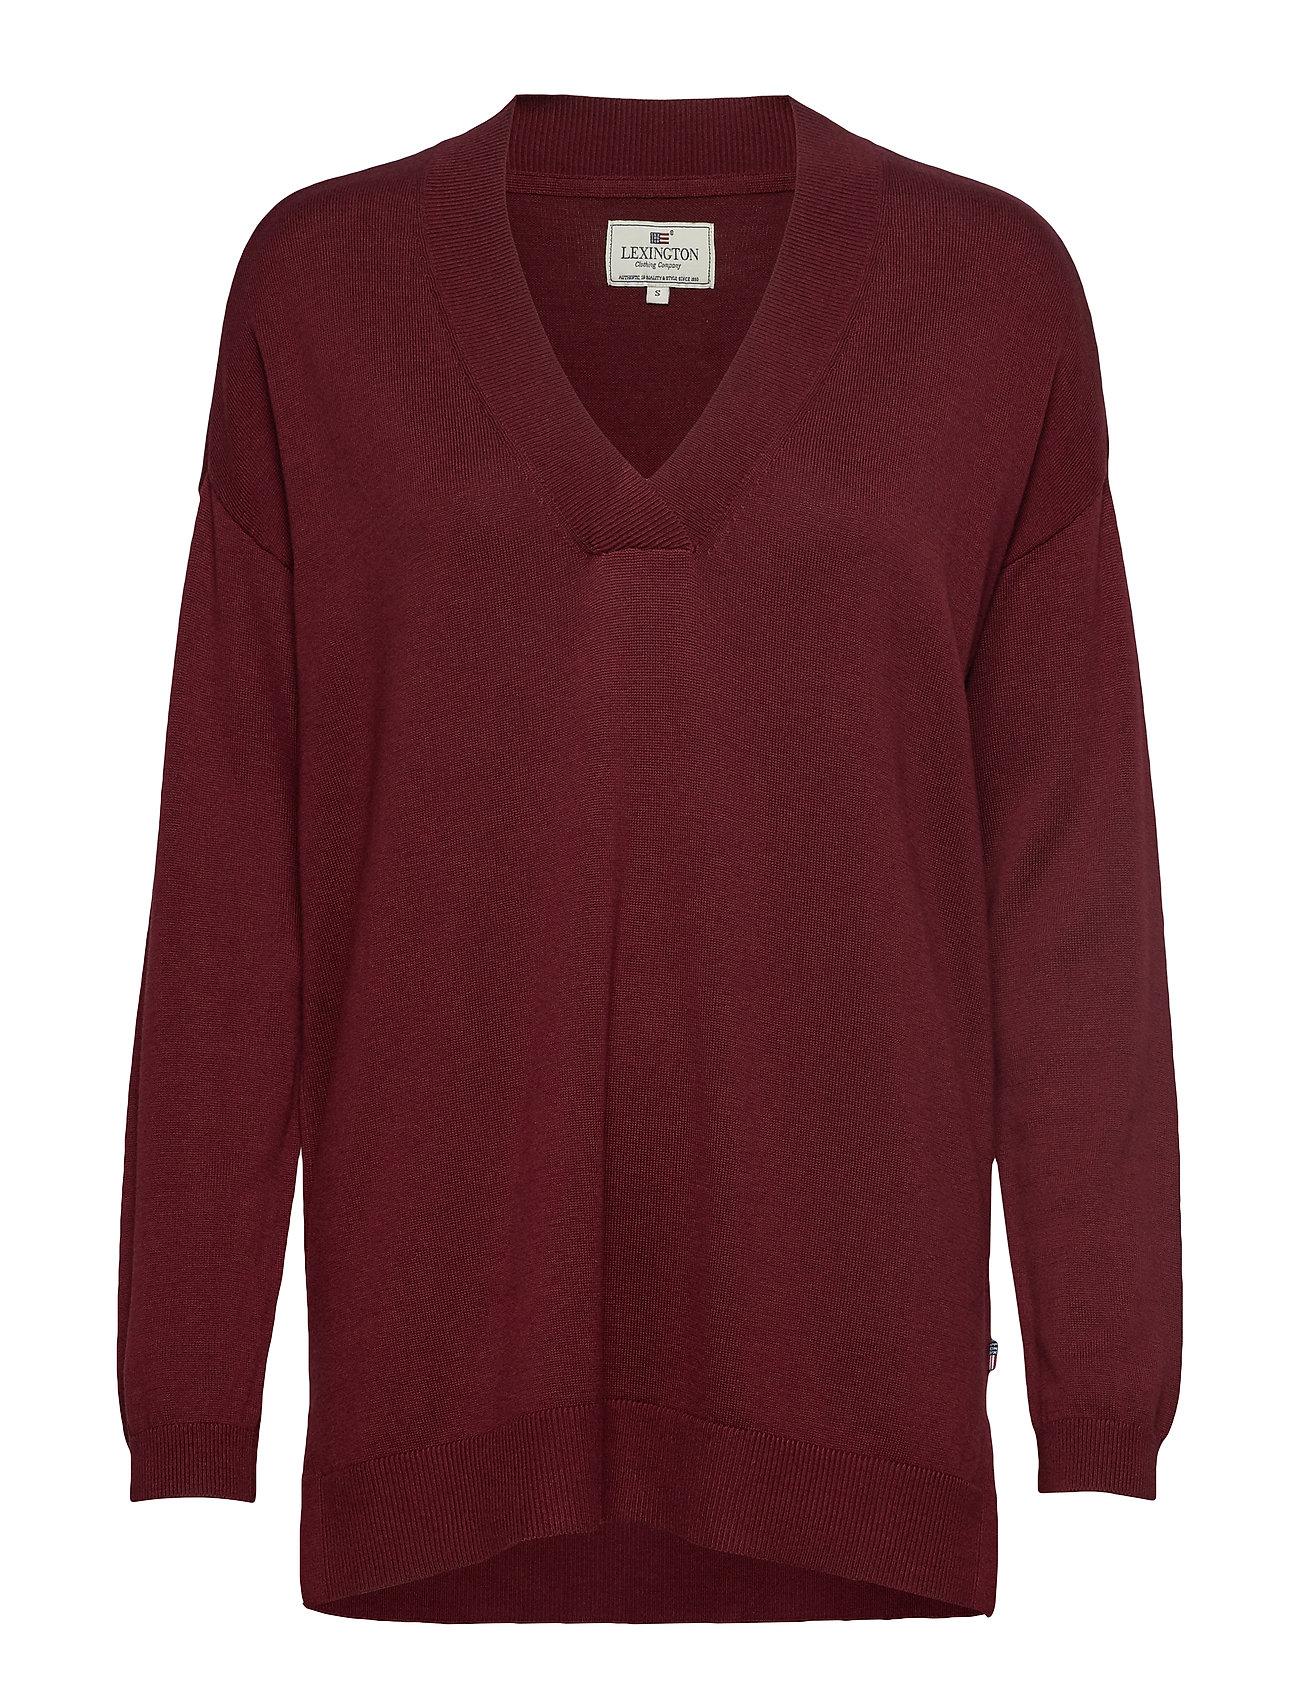 Lexington Clothing Ana V-neck Sweater - DARK RED